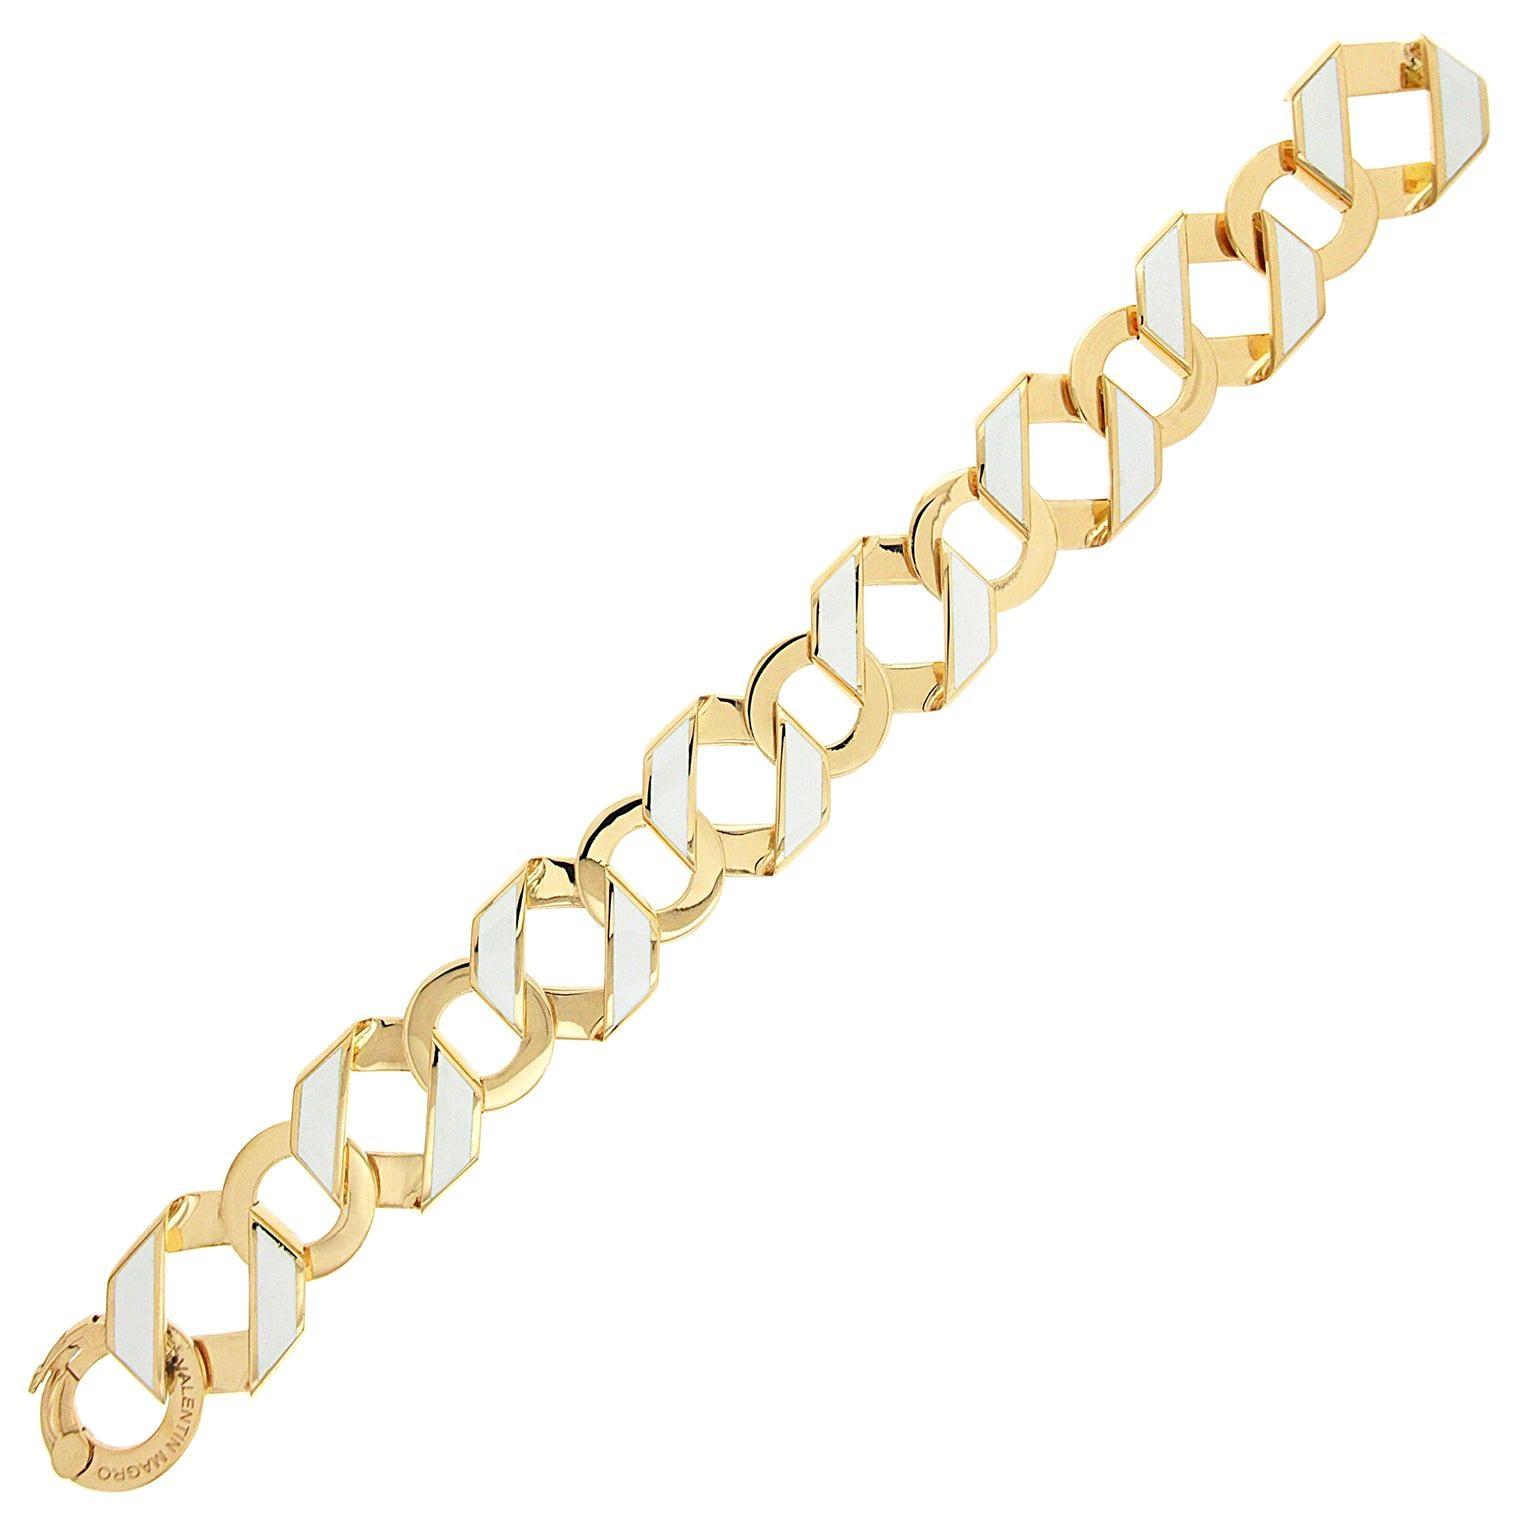 Valentin Magro Small Foldover Bracelet with White Enamel